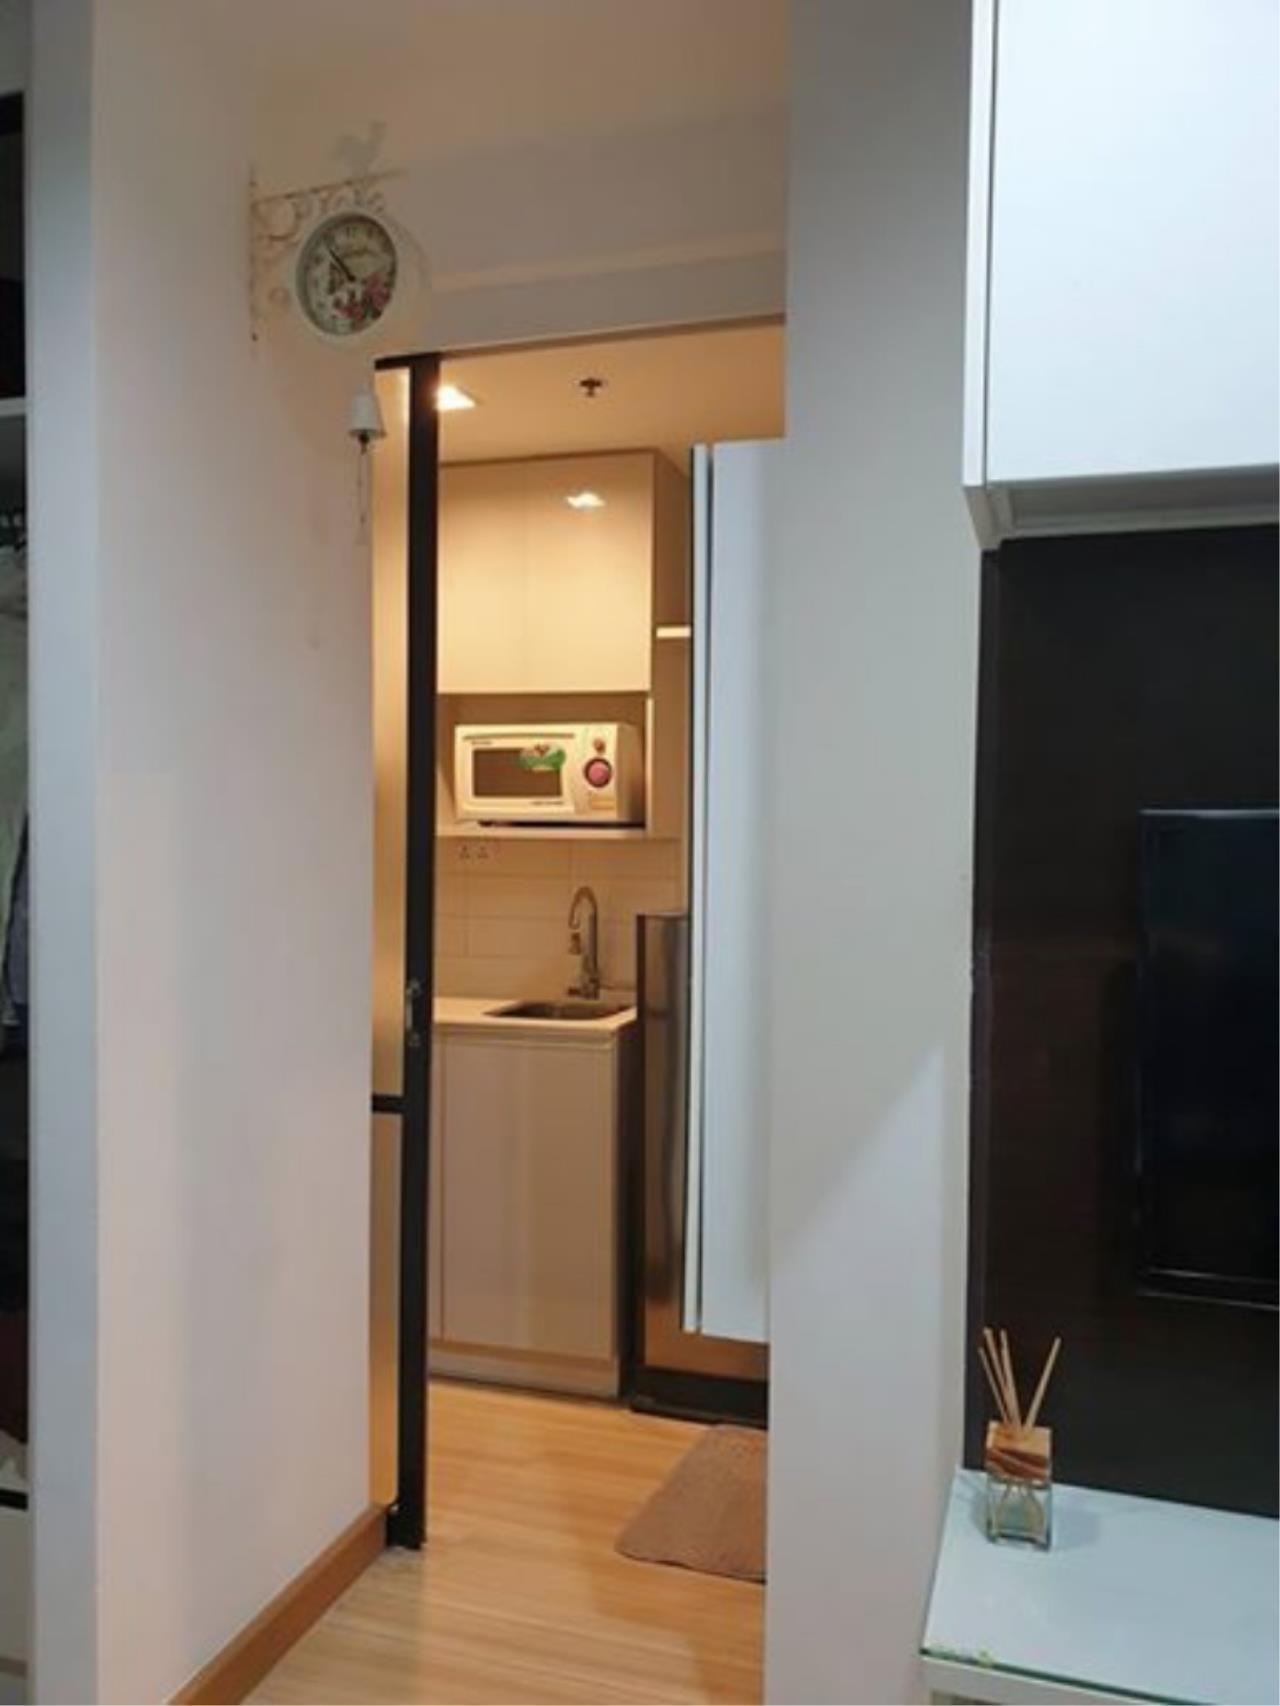 Century21 Skylux Agency's Ideo Mobi Phayathai / Condo For Sale / 1 Bedroom / 22 SQM / BTS Phaya Thai / Bangkok 4